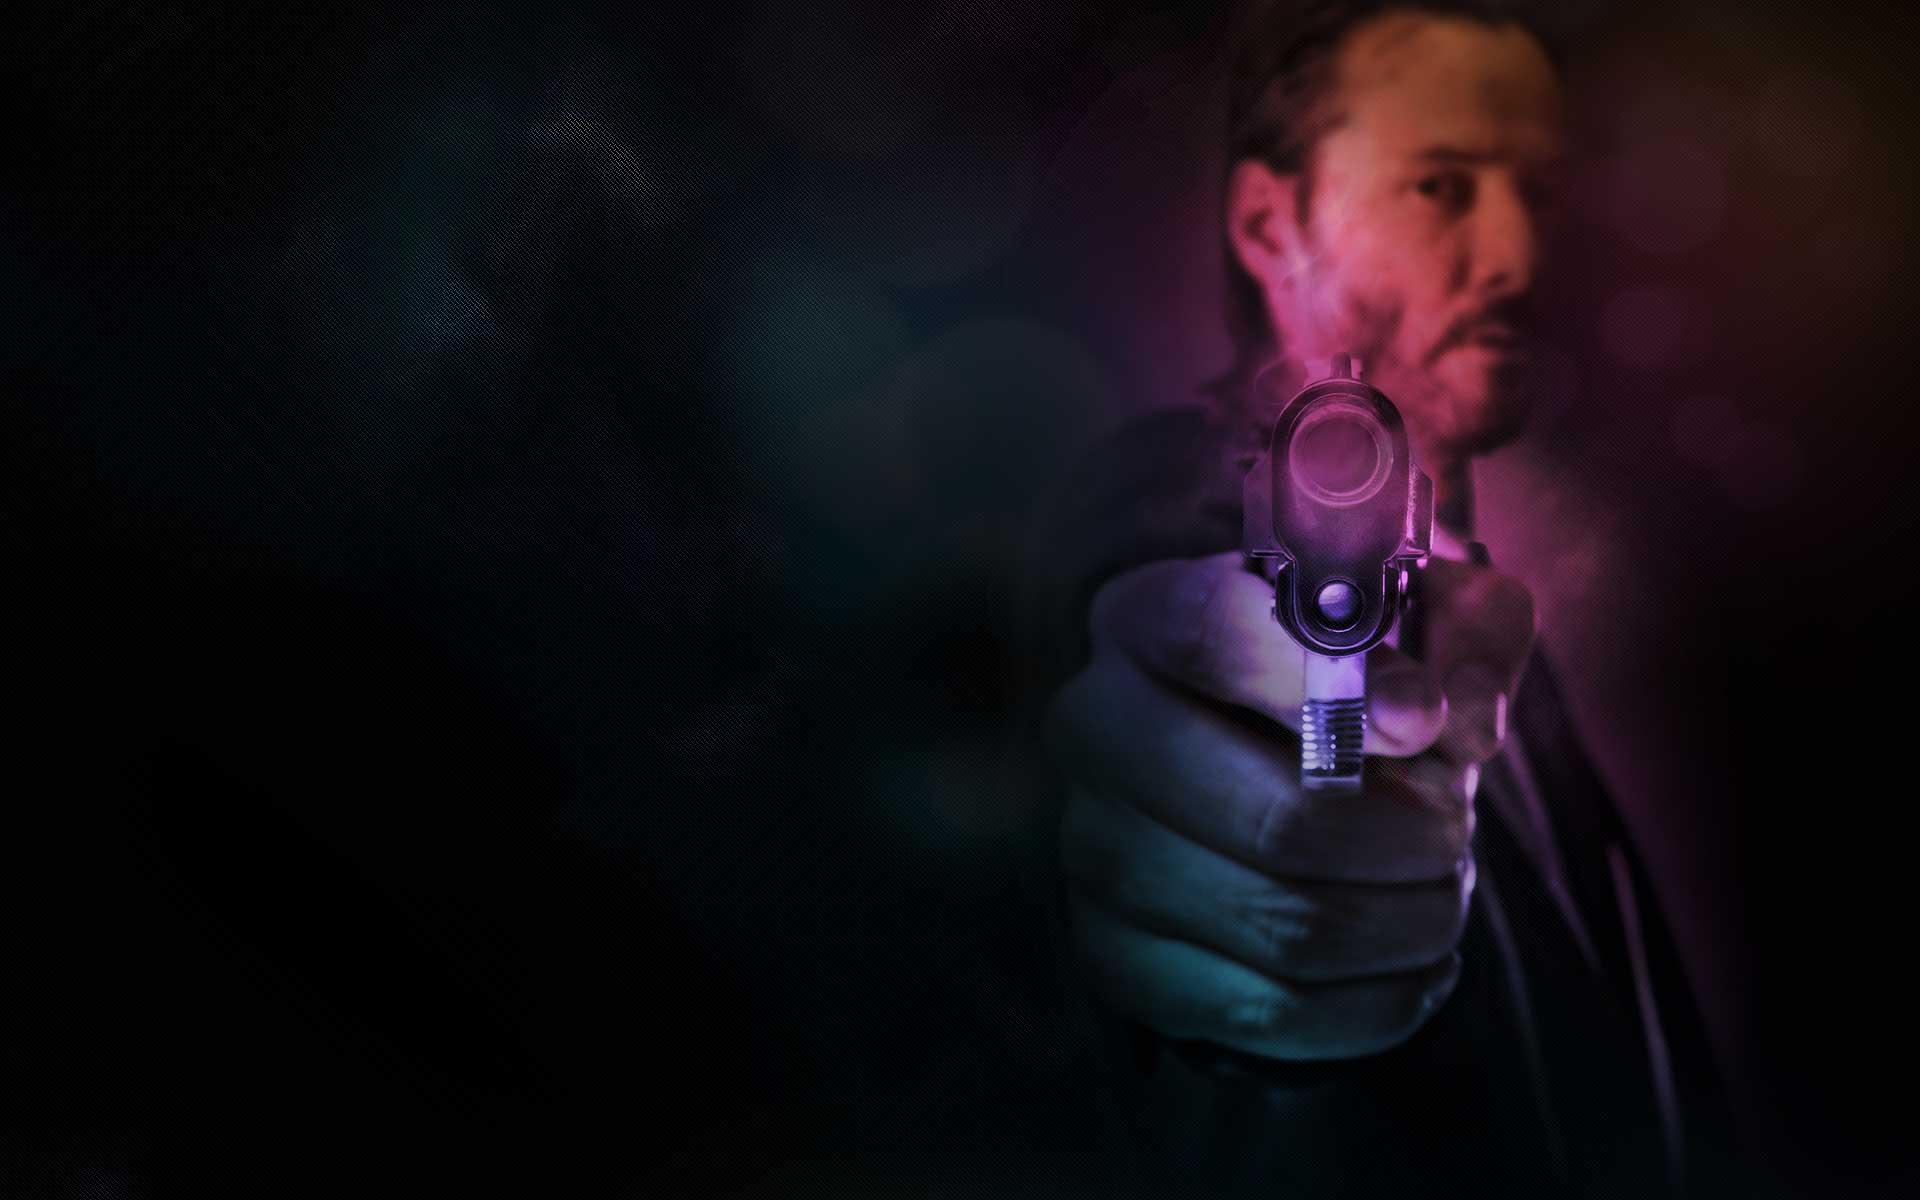 Fondo de pantalla de John Wick 2 Imágenes